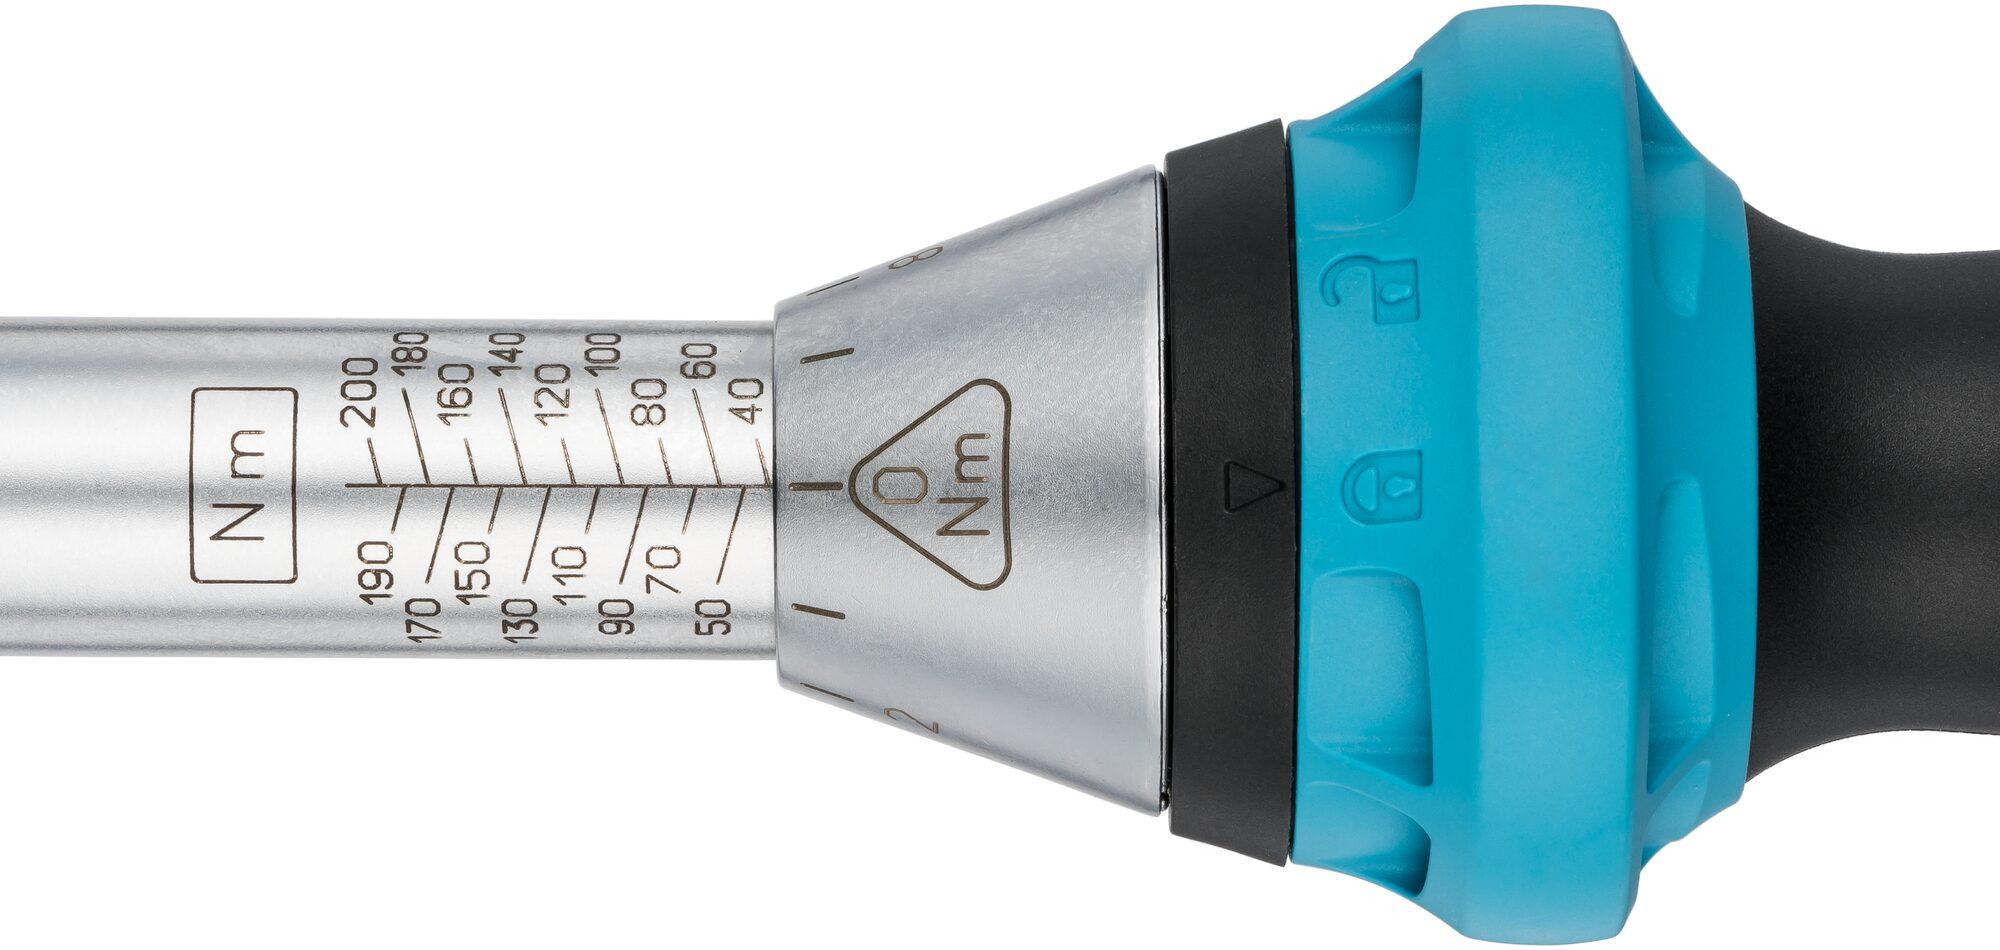 HAZET Drehmoment-Schlüssel 5122-3CT ∙ Nm min-max: 40–200 Nm ∙ Toleranz: 3% ∙ Vierkant massiv 12,5 mm (1/2 Zoll)